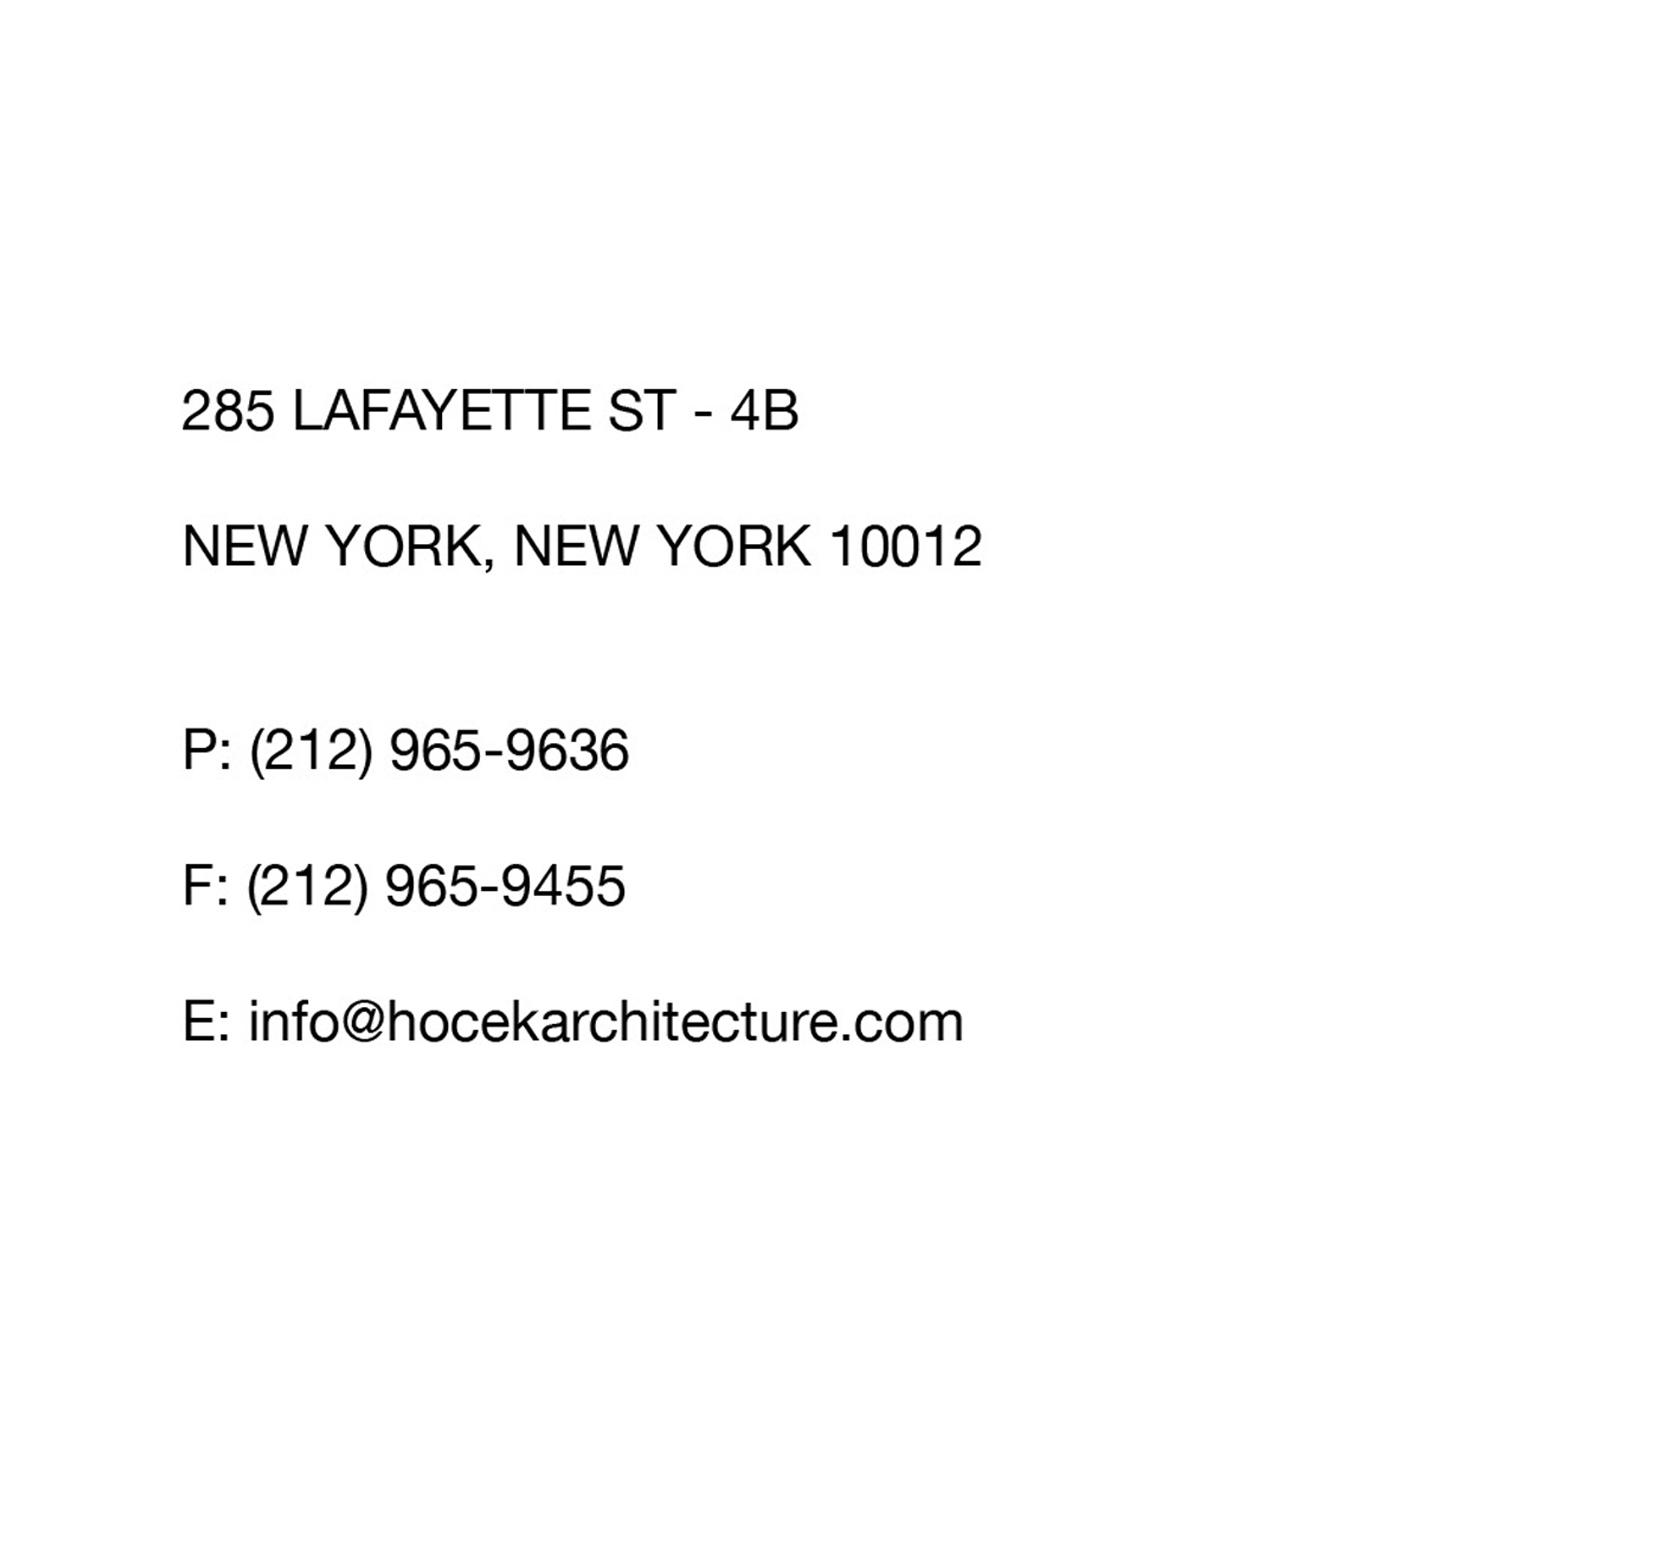 285 Lafayette St-4B, New York, NY 10012, P:2129659636, E:info@hocekarchitecture.com